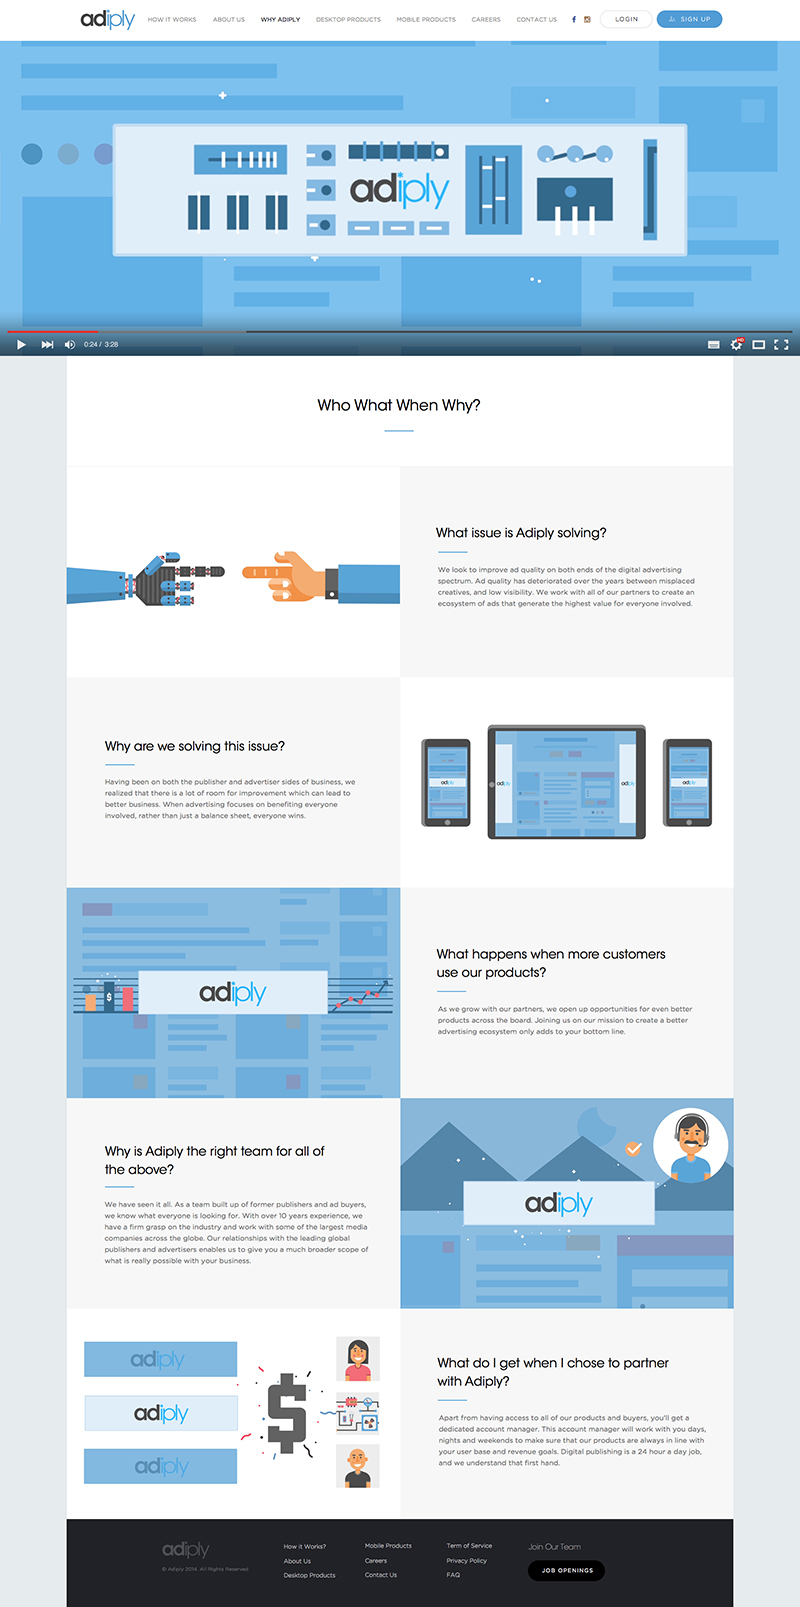 adiply Web Design